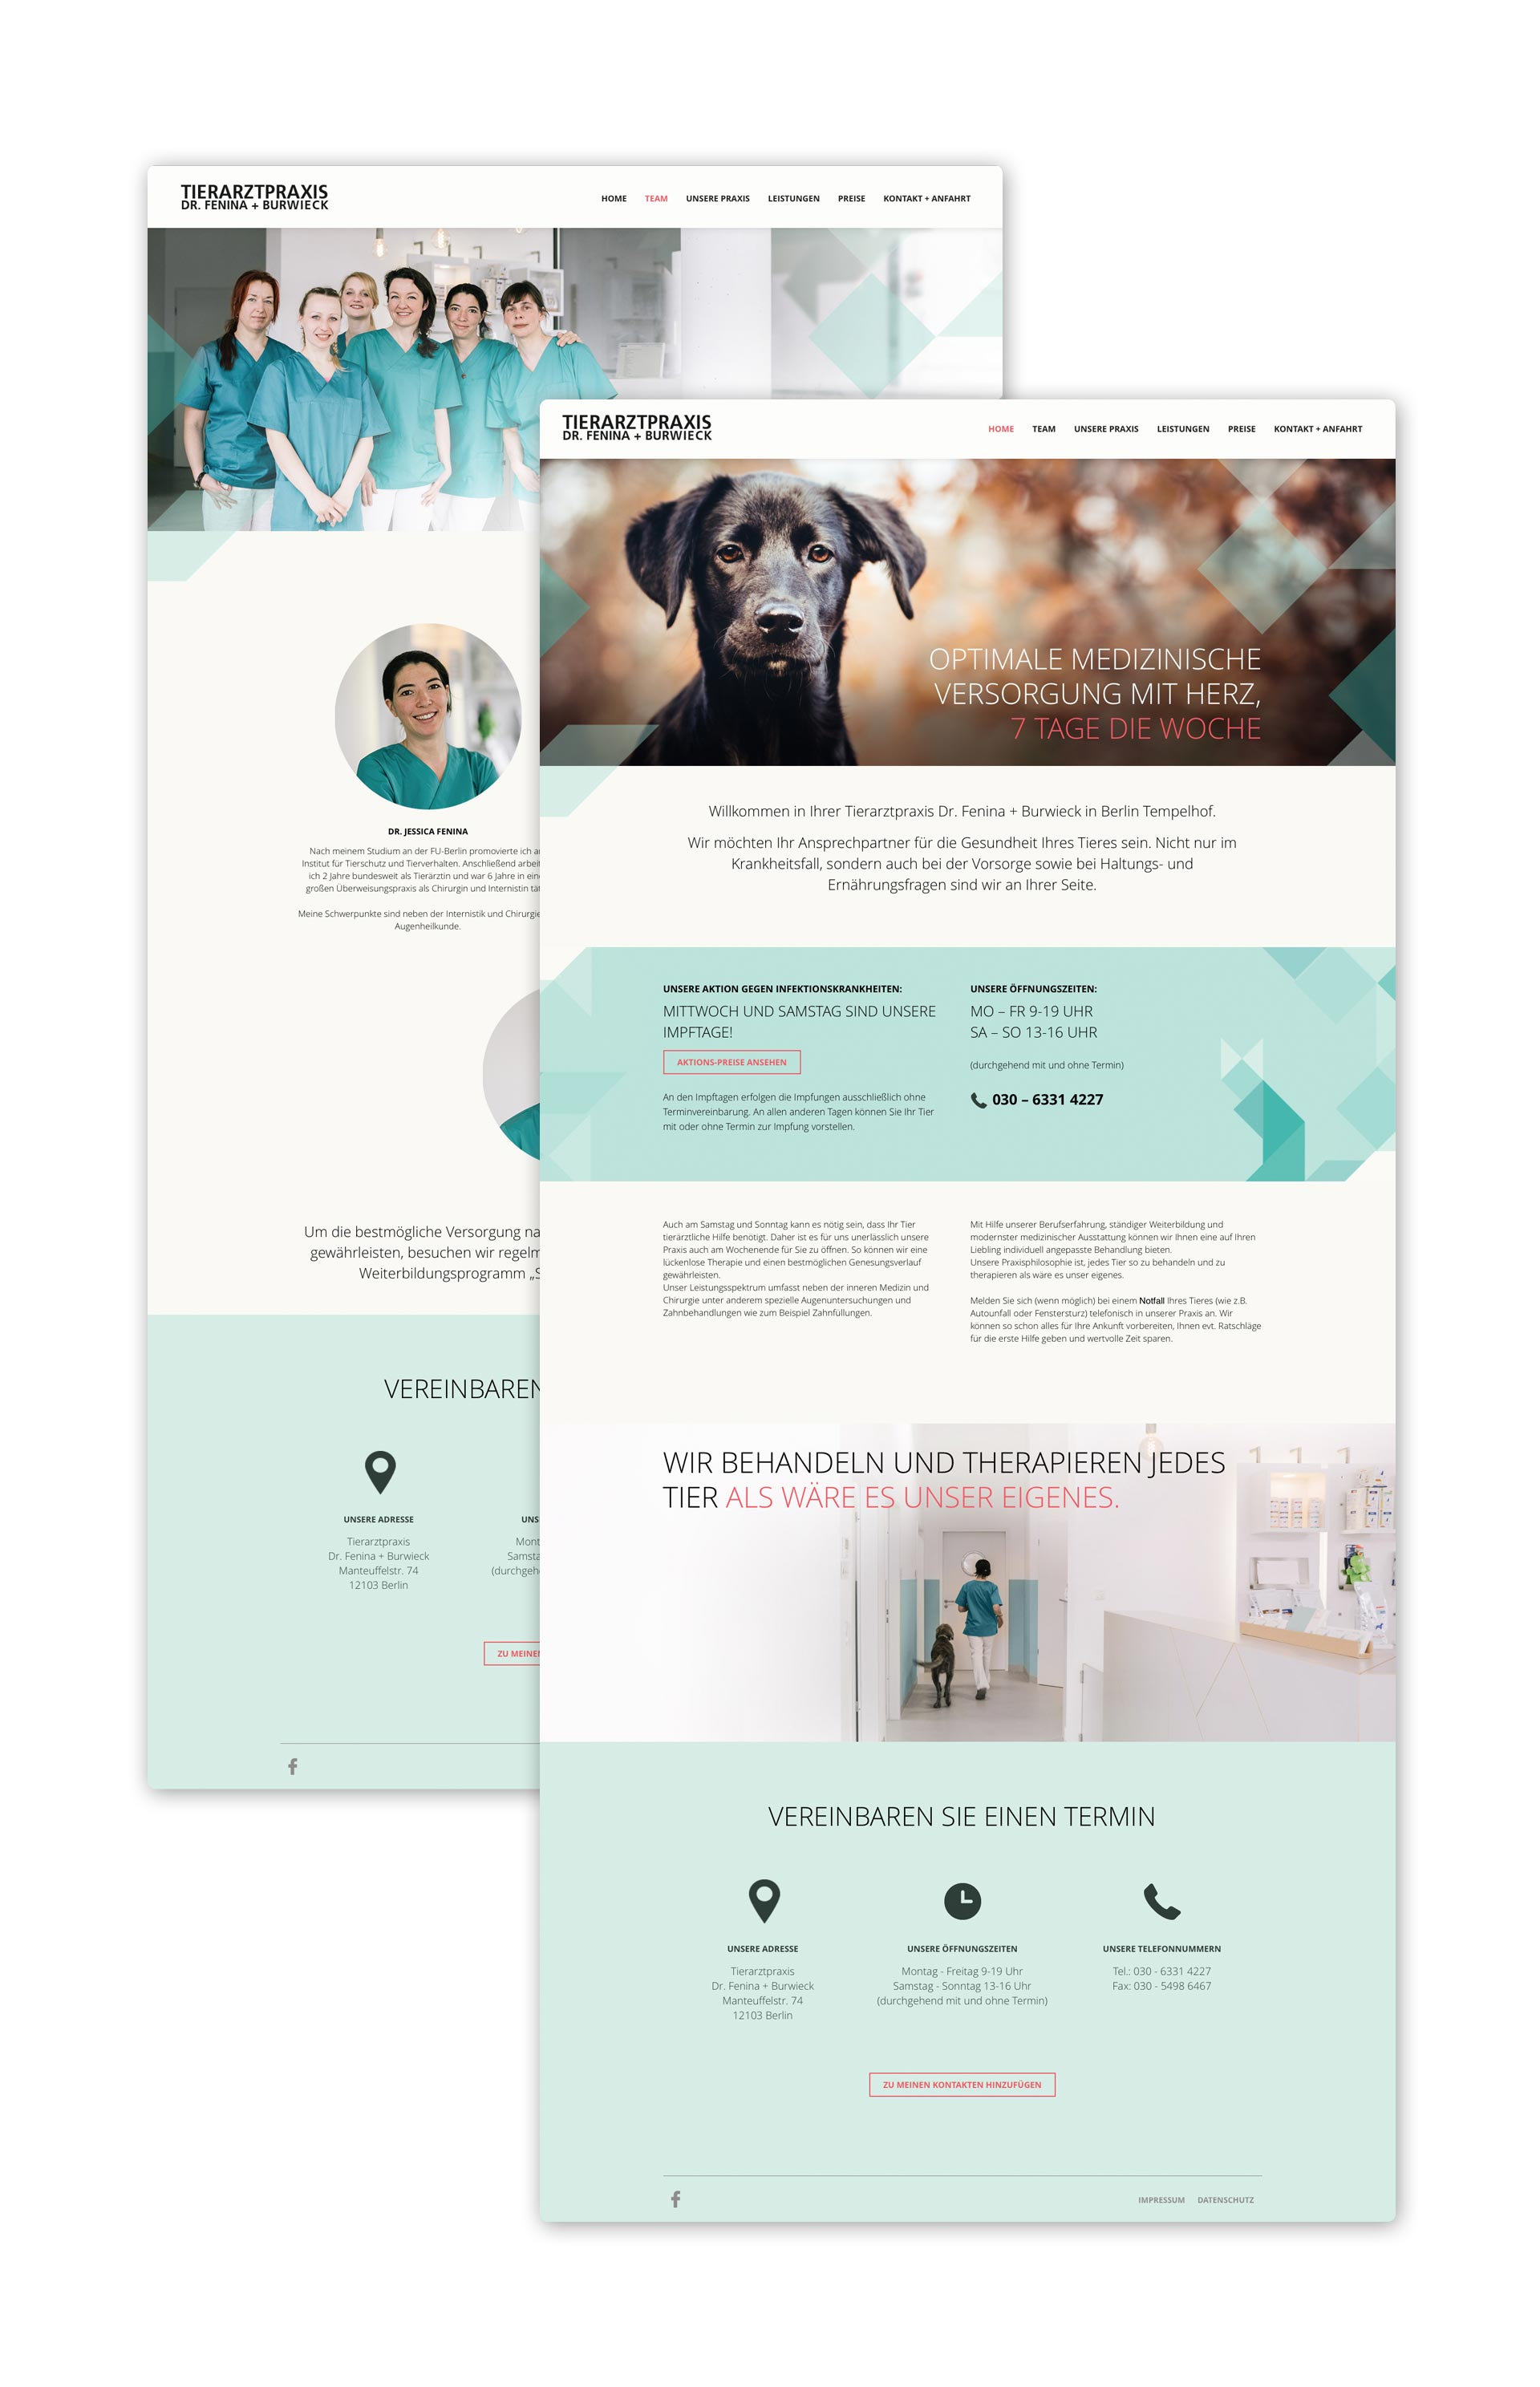 blokstudio_Tierarztpraxis_Dr_Fenina_Burwiek_Webdesign_Screens